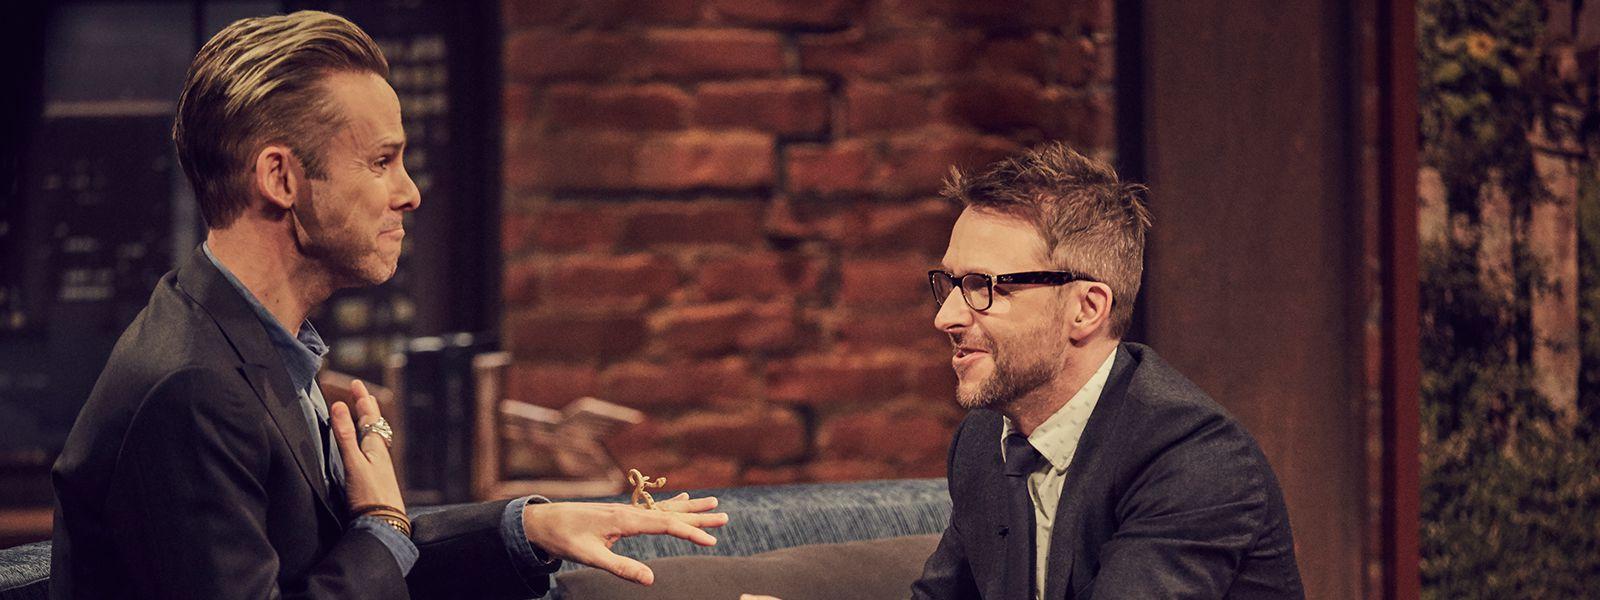 talking-with-chris-hardwick-episode-114-dominic-monaghan-chris-hardwick-800×600